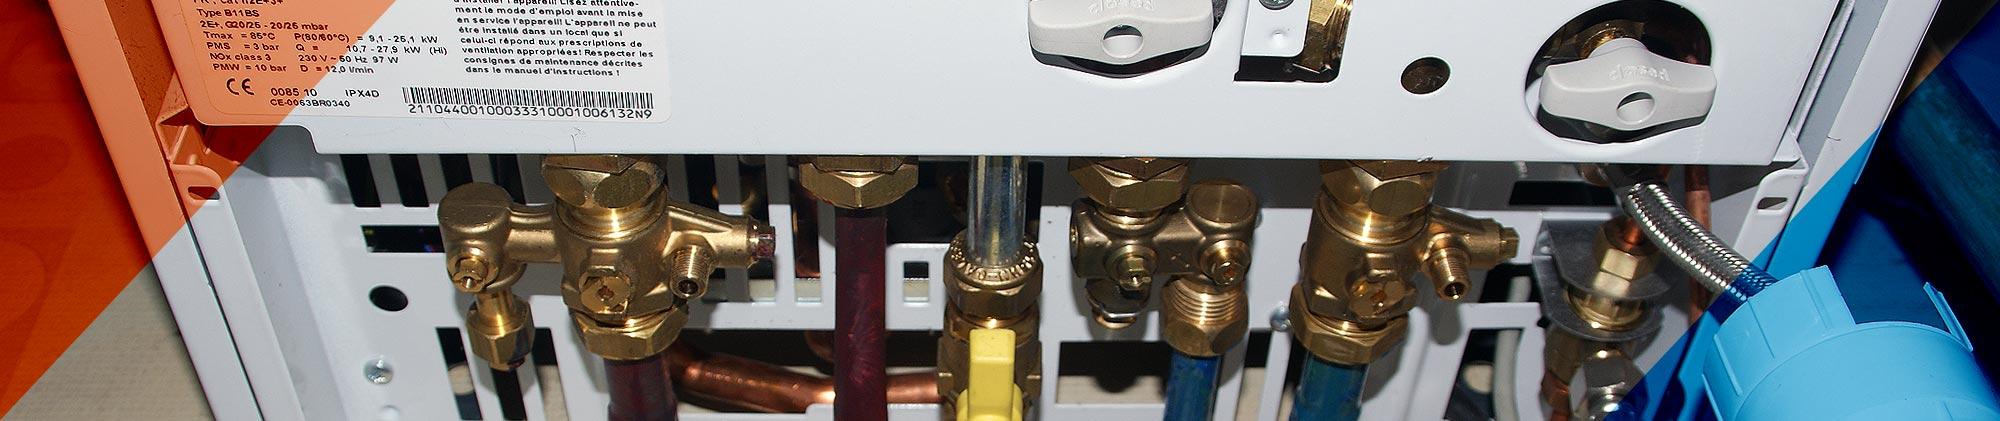 Idee Salle De Bain Recup ~ plomberie chauffage salle de bain plombier chauffagiste quimper